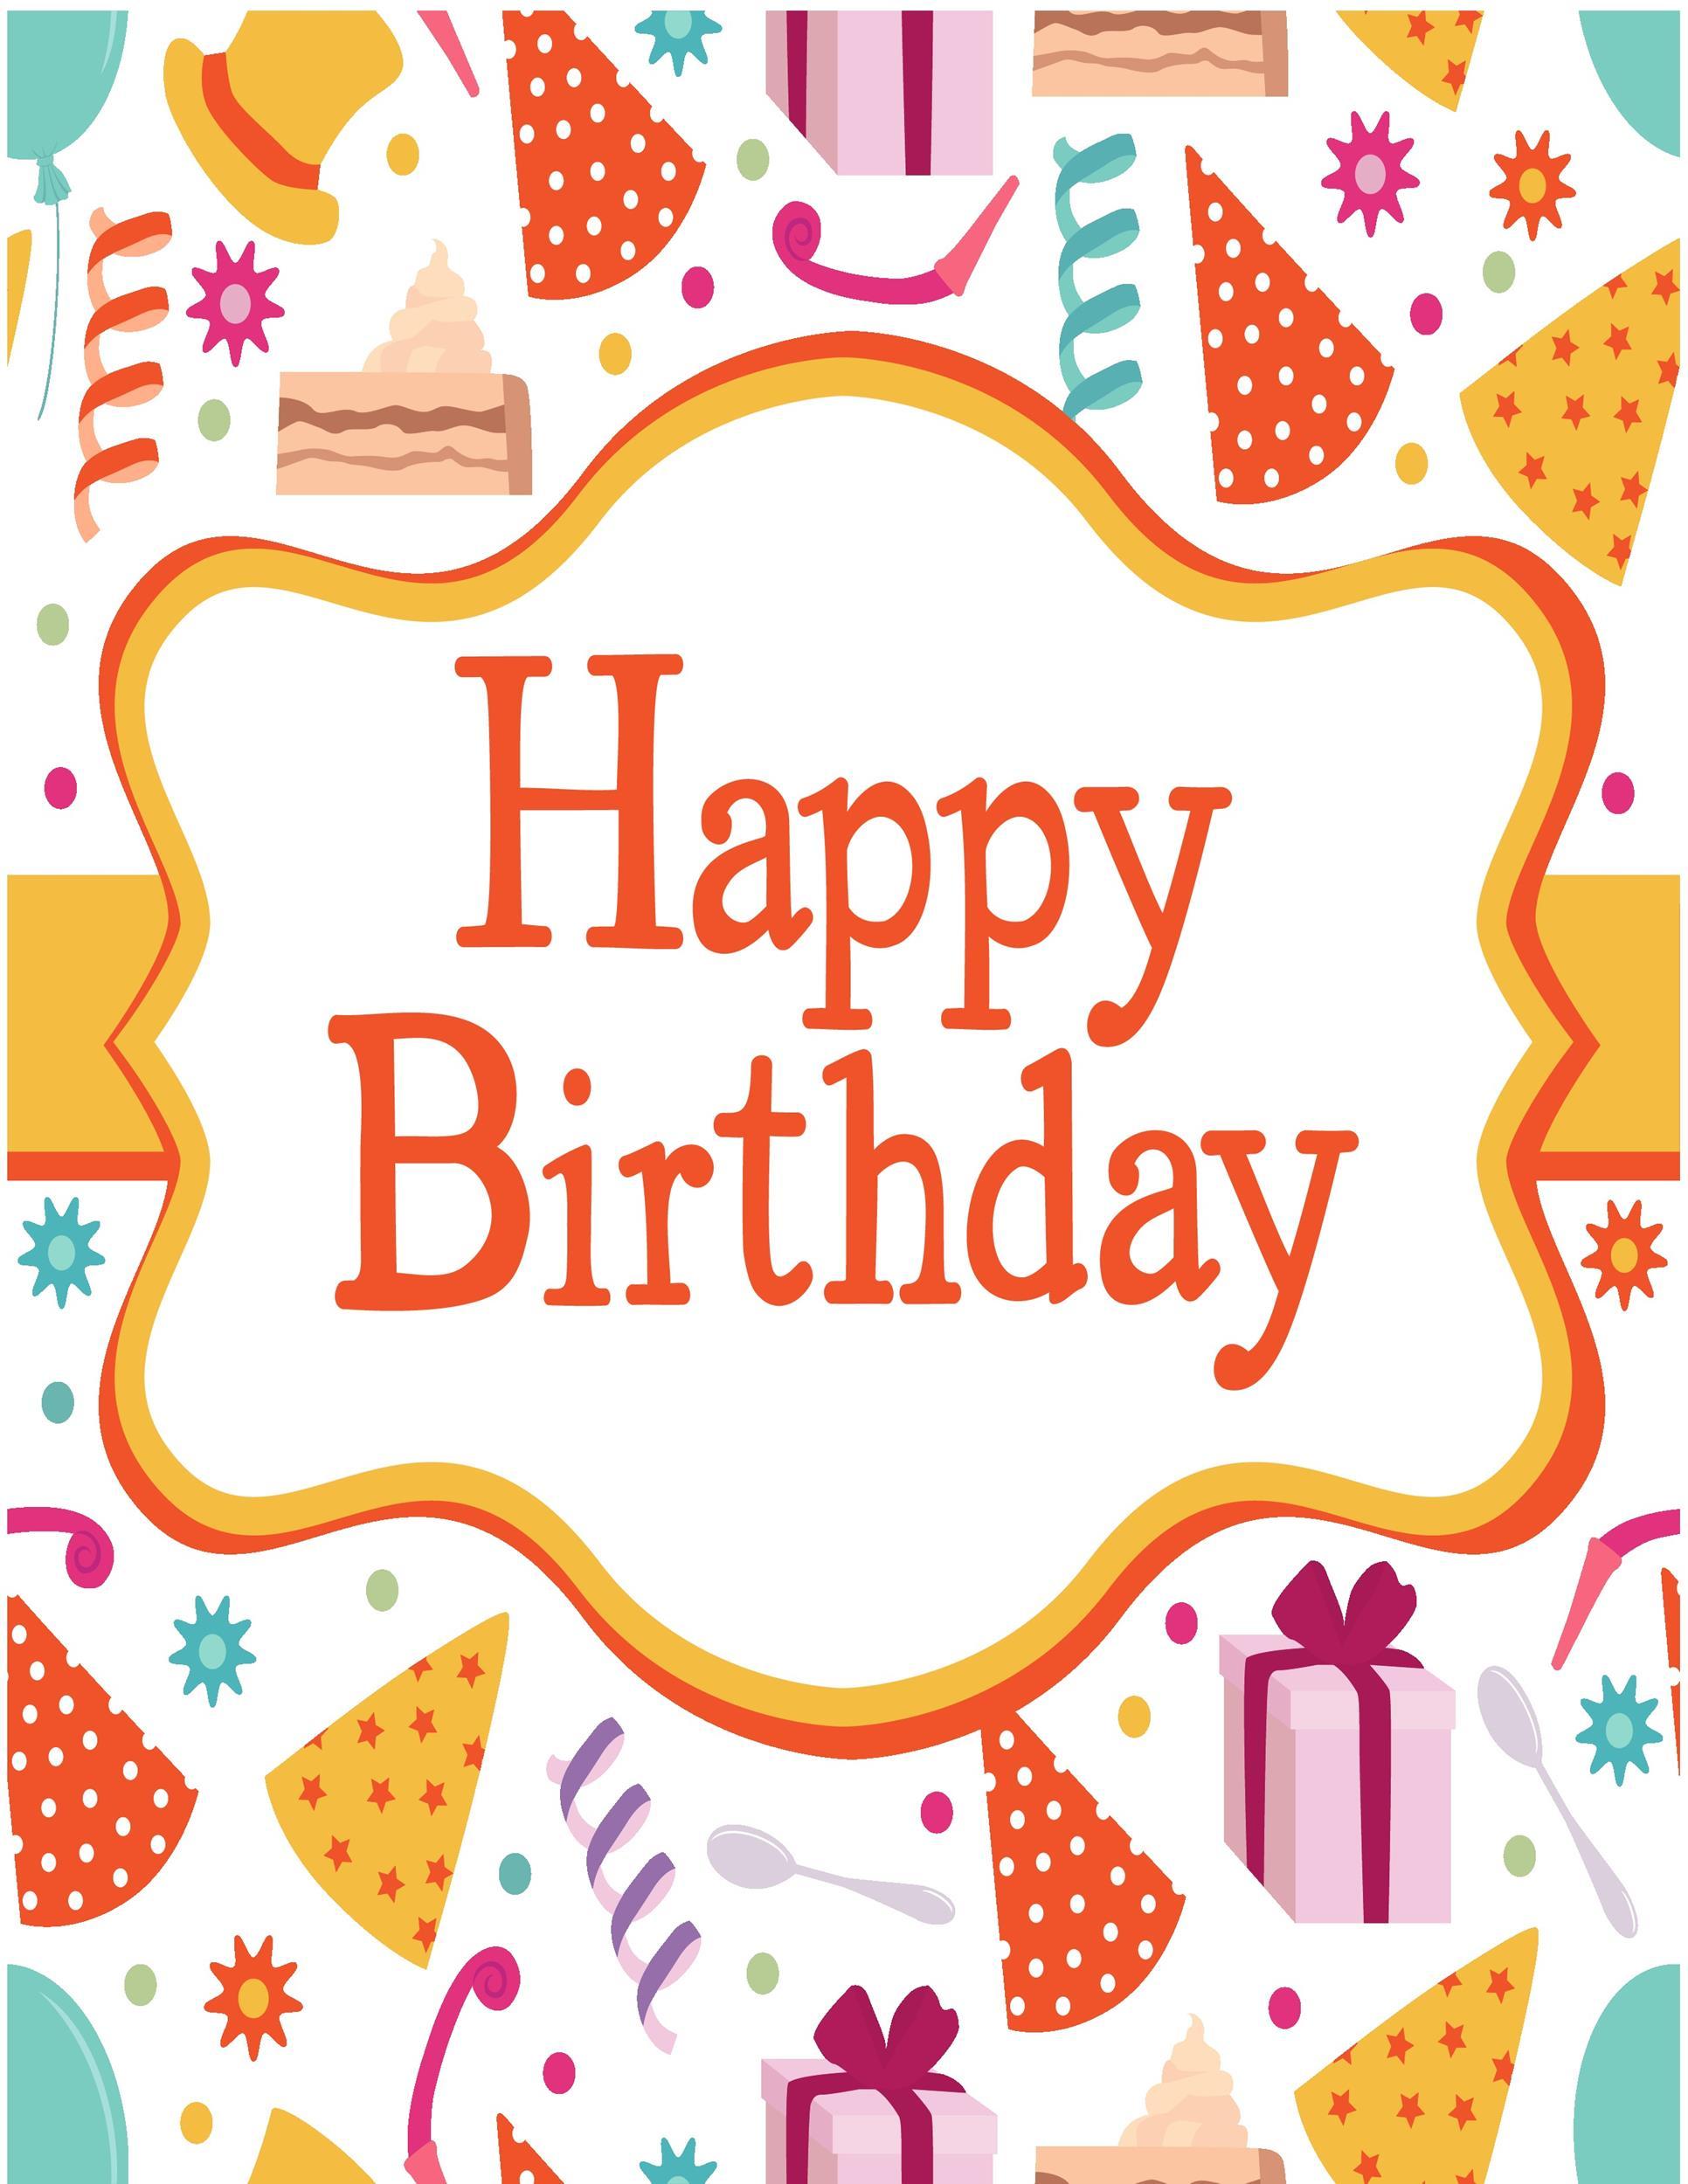 Free birthday card template 25